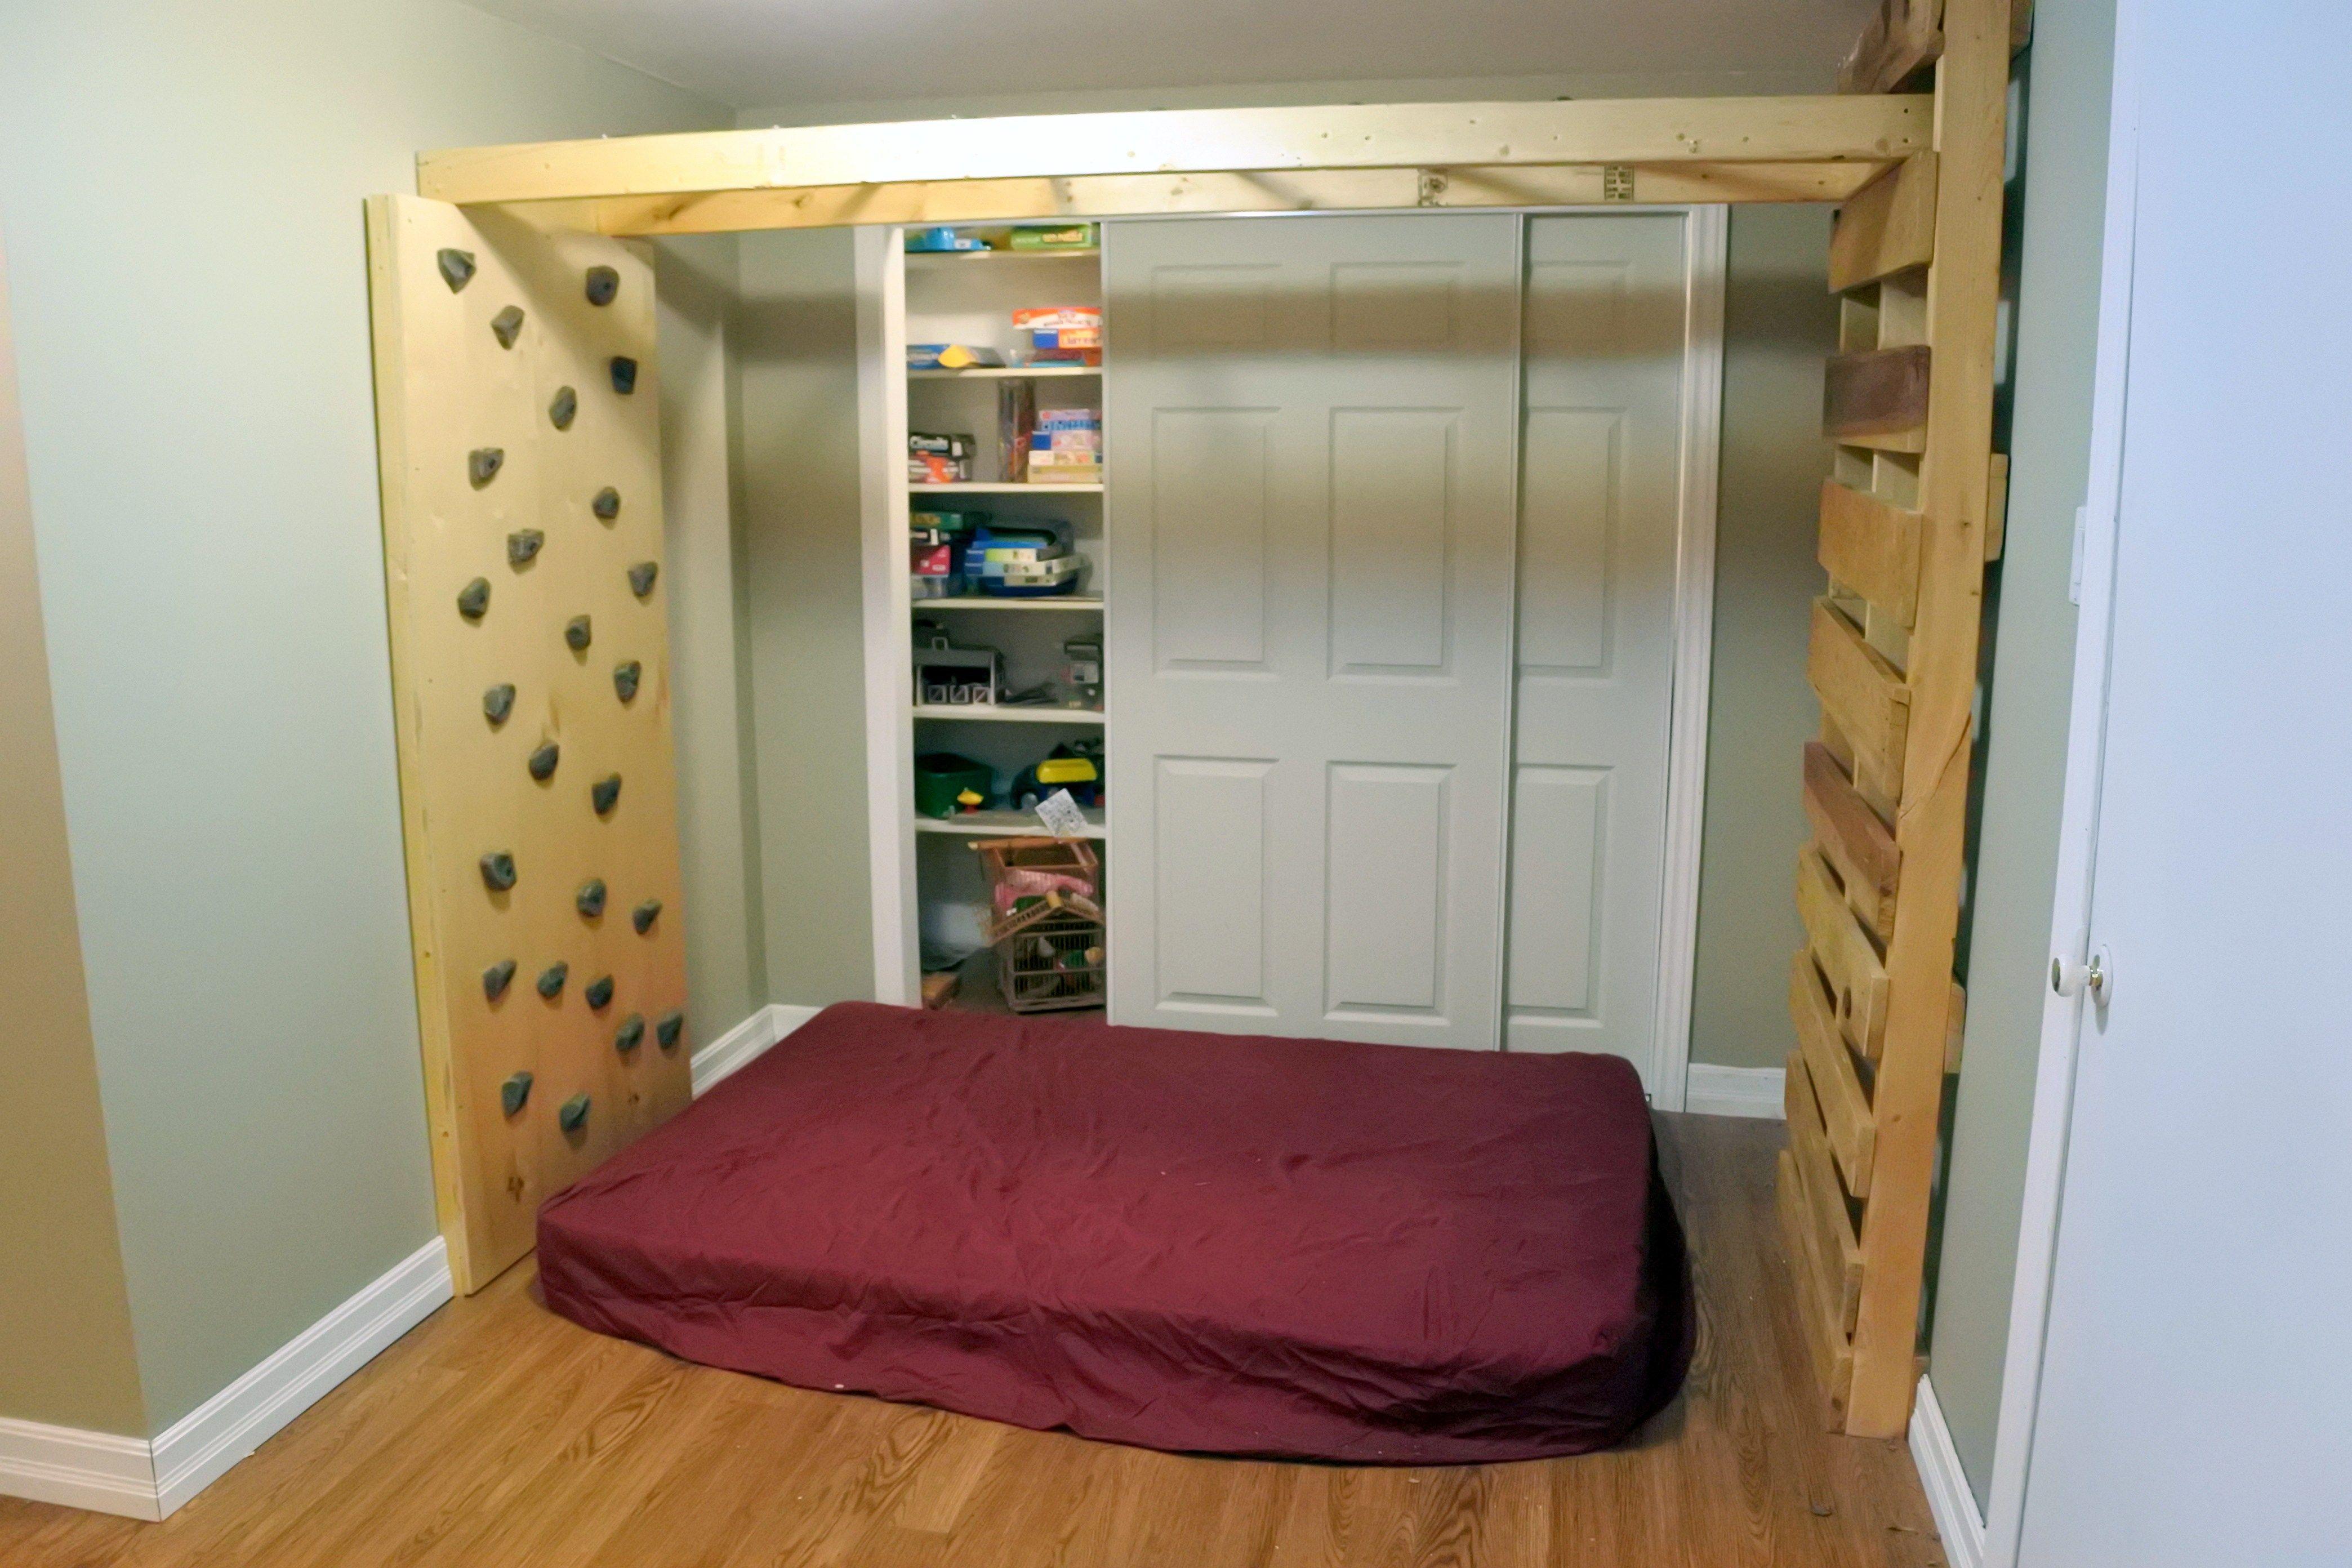 indoorjunglegym DIY monkey bars indoor playground climbing